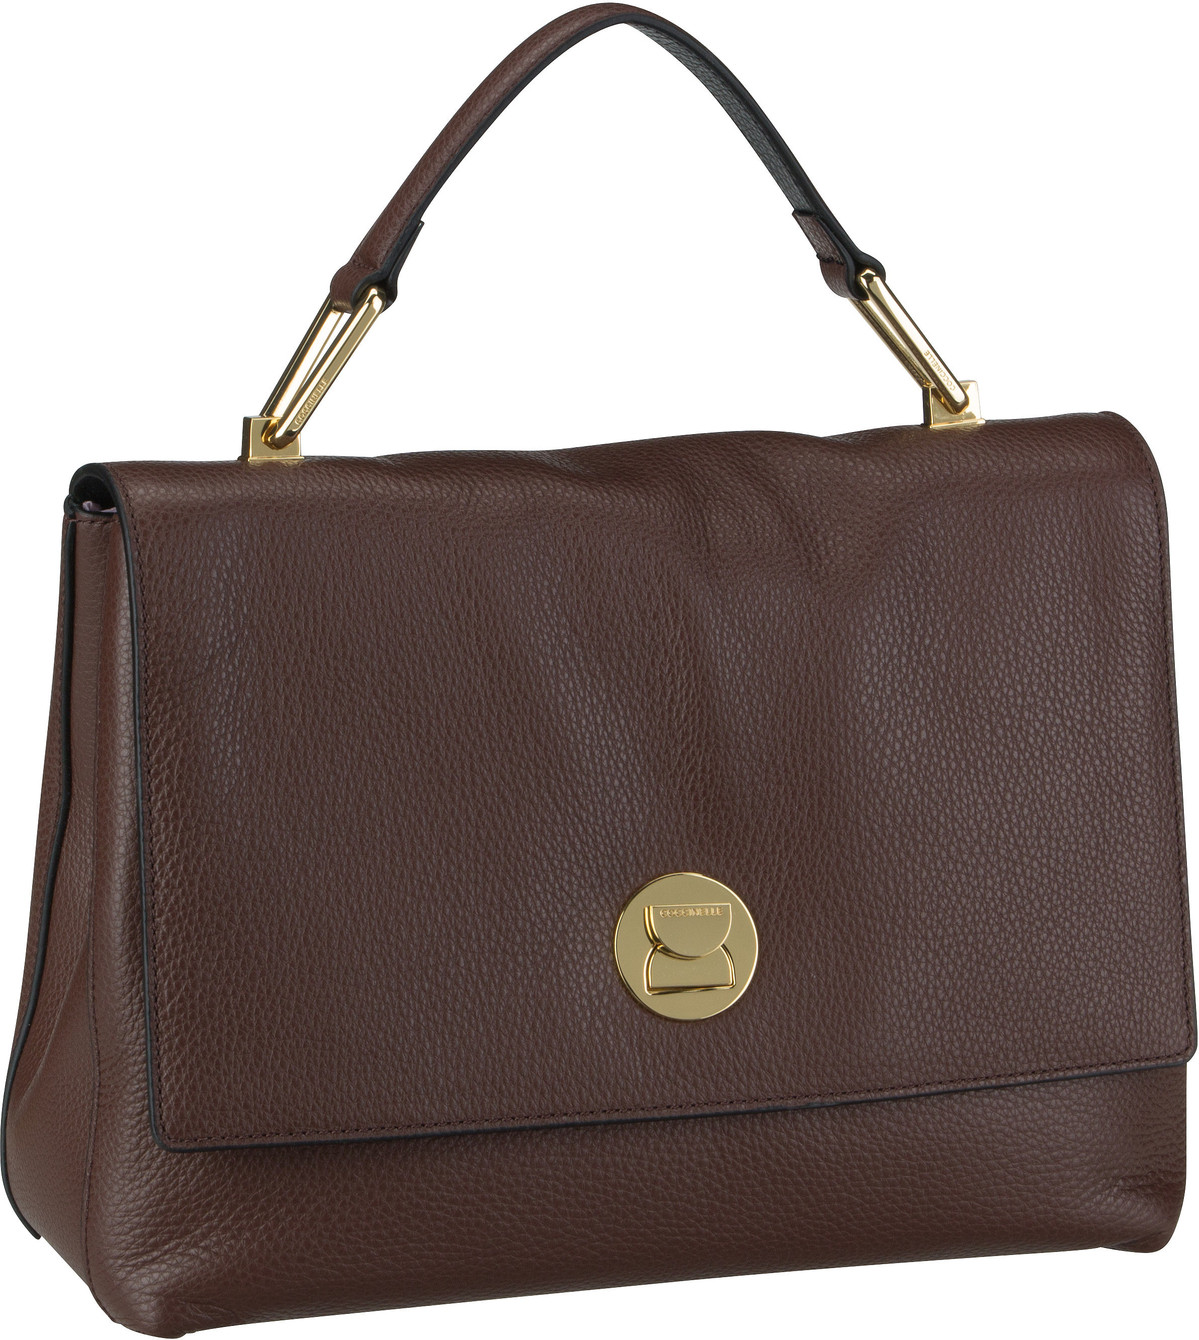 Handtasche Liya 1801 Chocolate/Nero